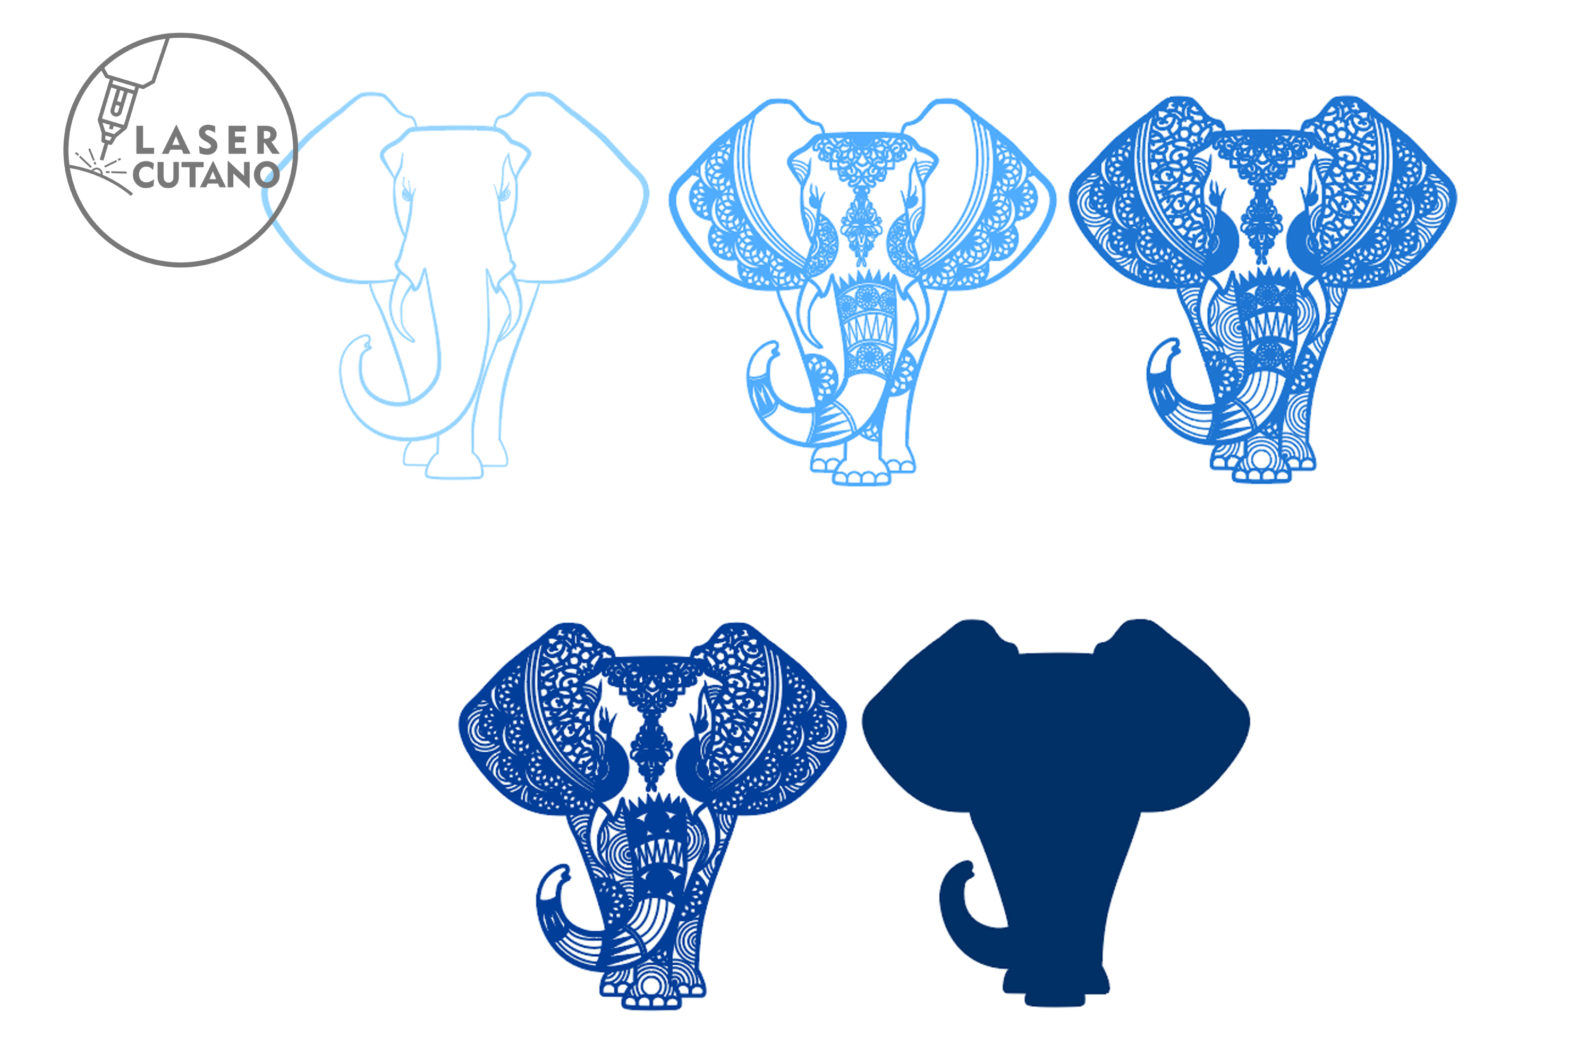 Multilayer Cut File ELEPHANT for Cricut or Laser Cut - elephant laser cut files lasercutano 4 scaled -